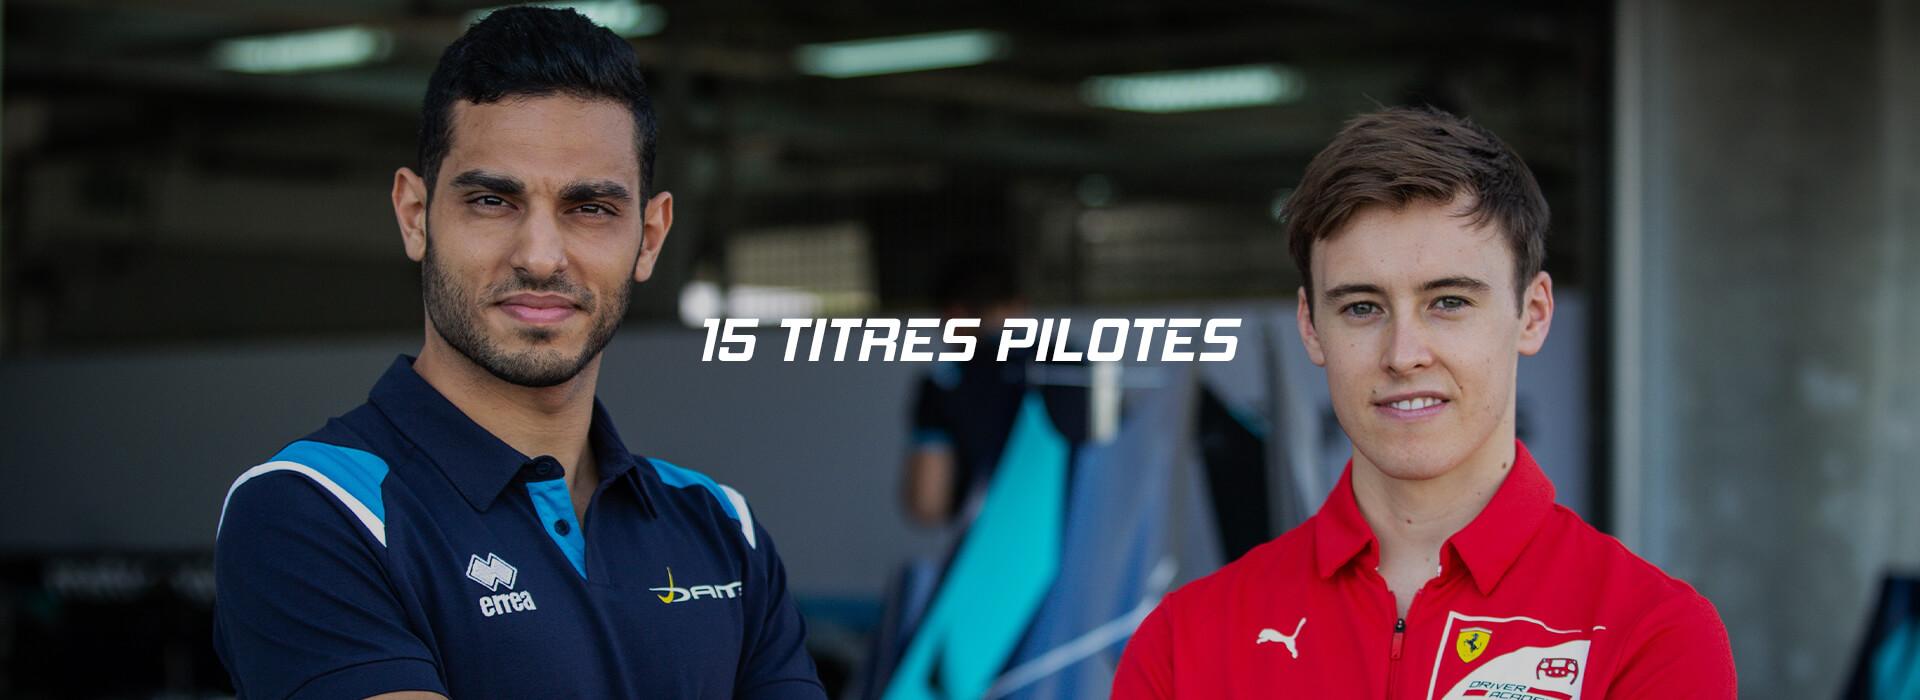 15 titres pilotes